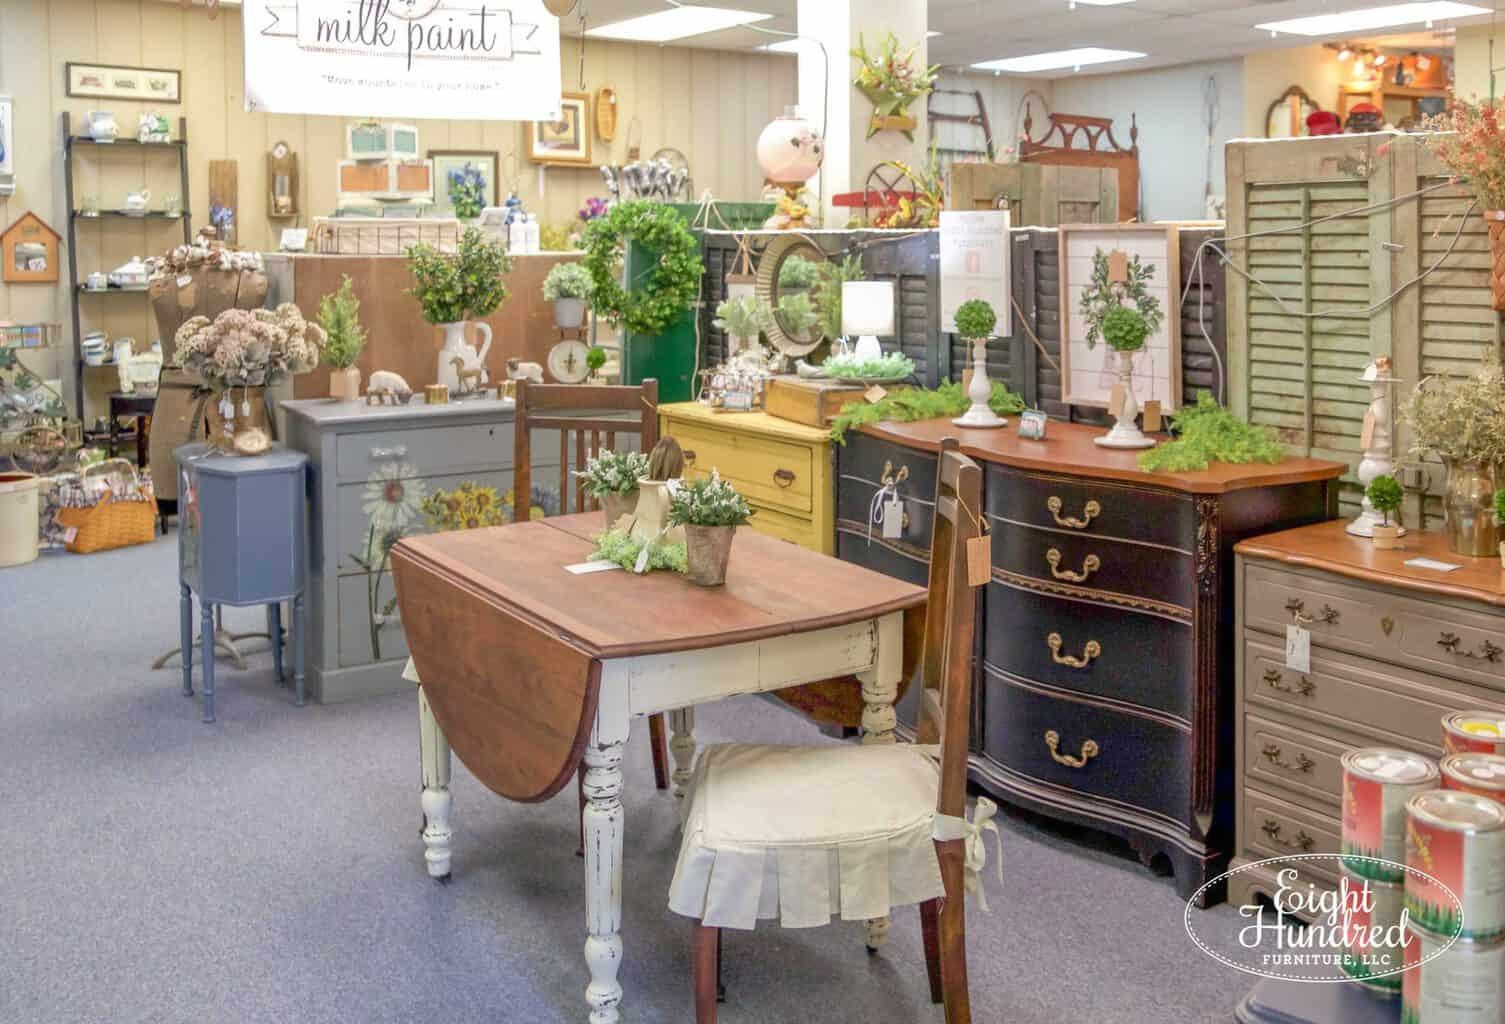 morgantown market, morgantown pa, antique co-op, antique shop, eight hundred furniture